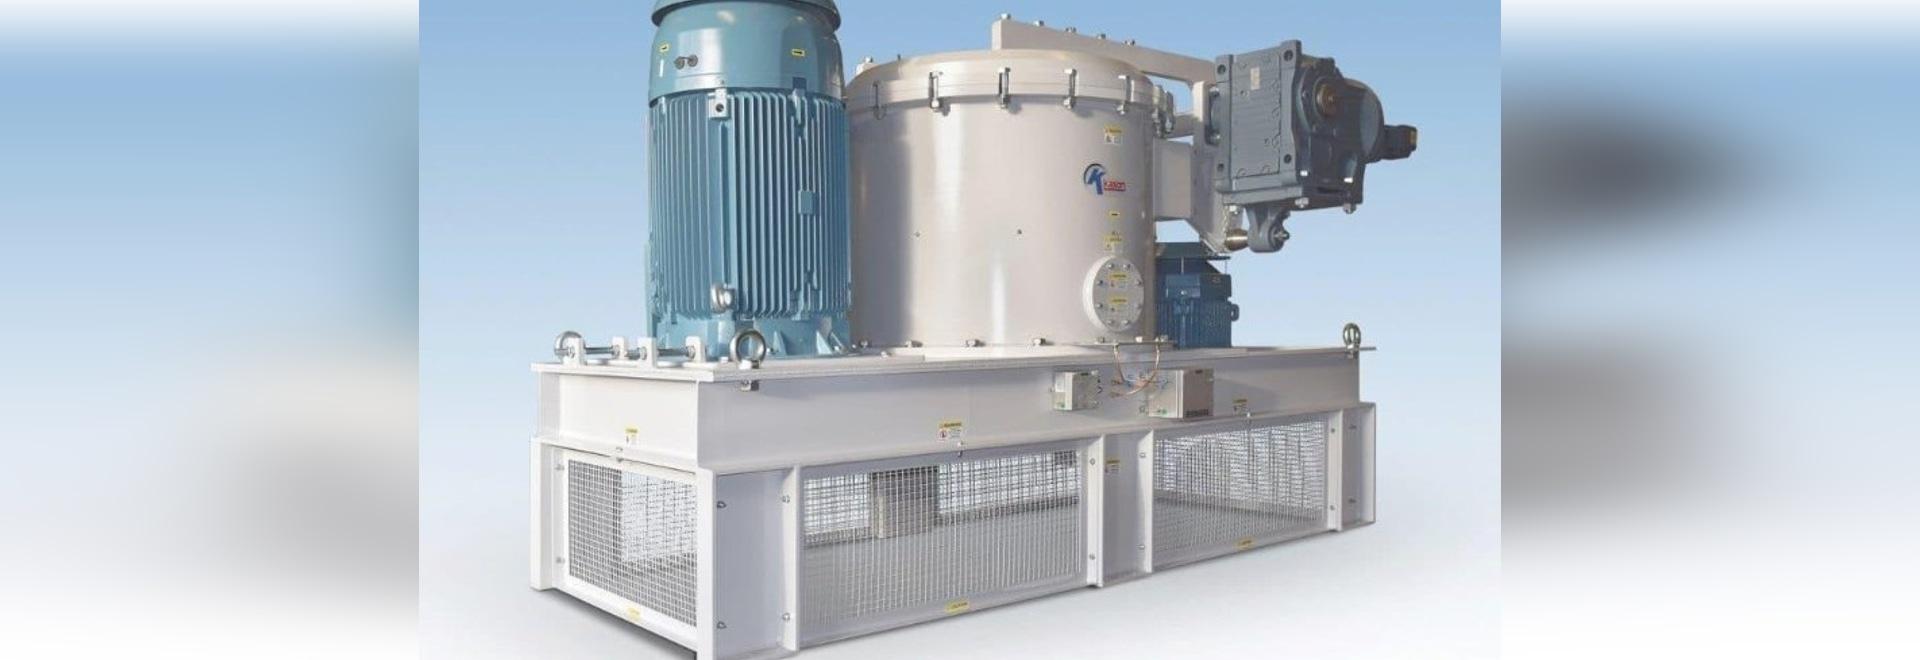 Air Classifier Mill CAM 1300